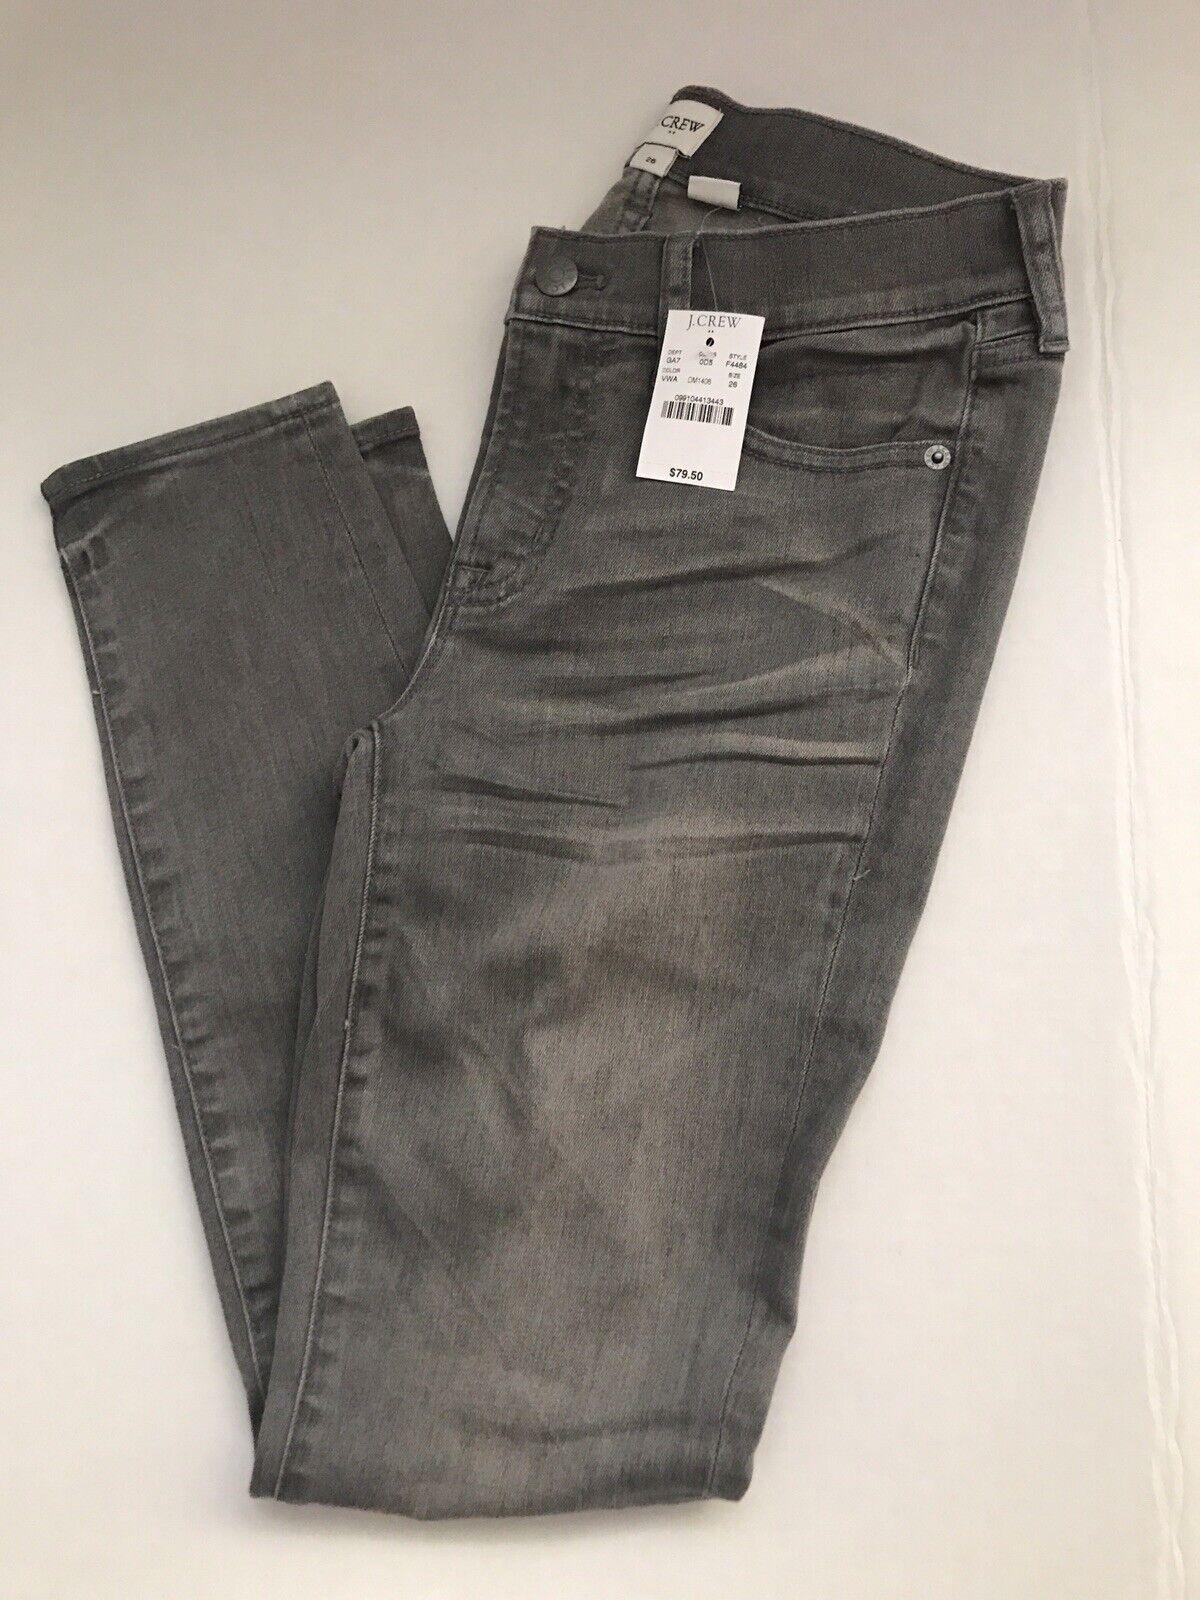 J Crew Jeans Size 26